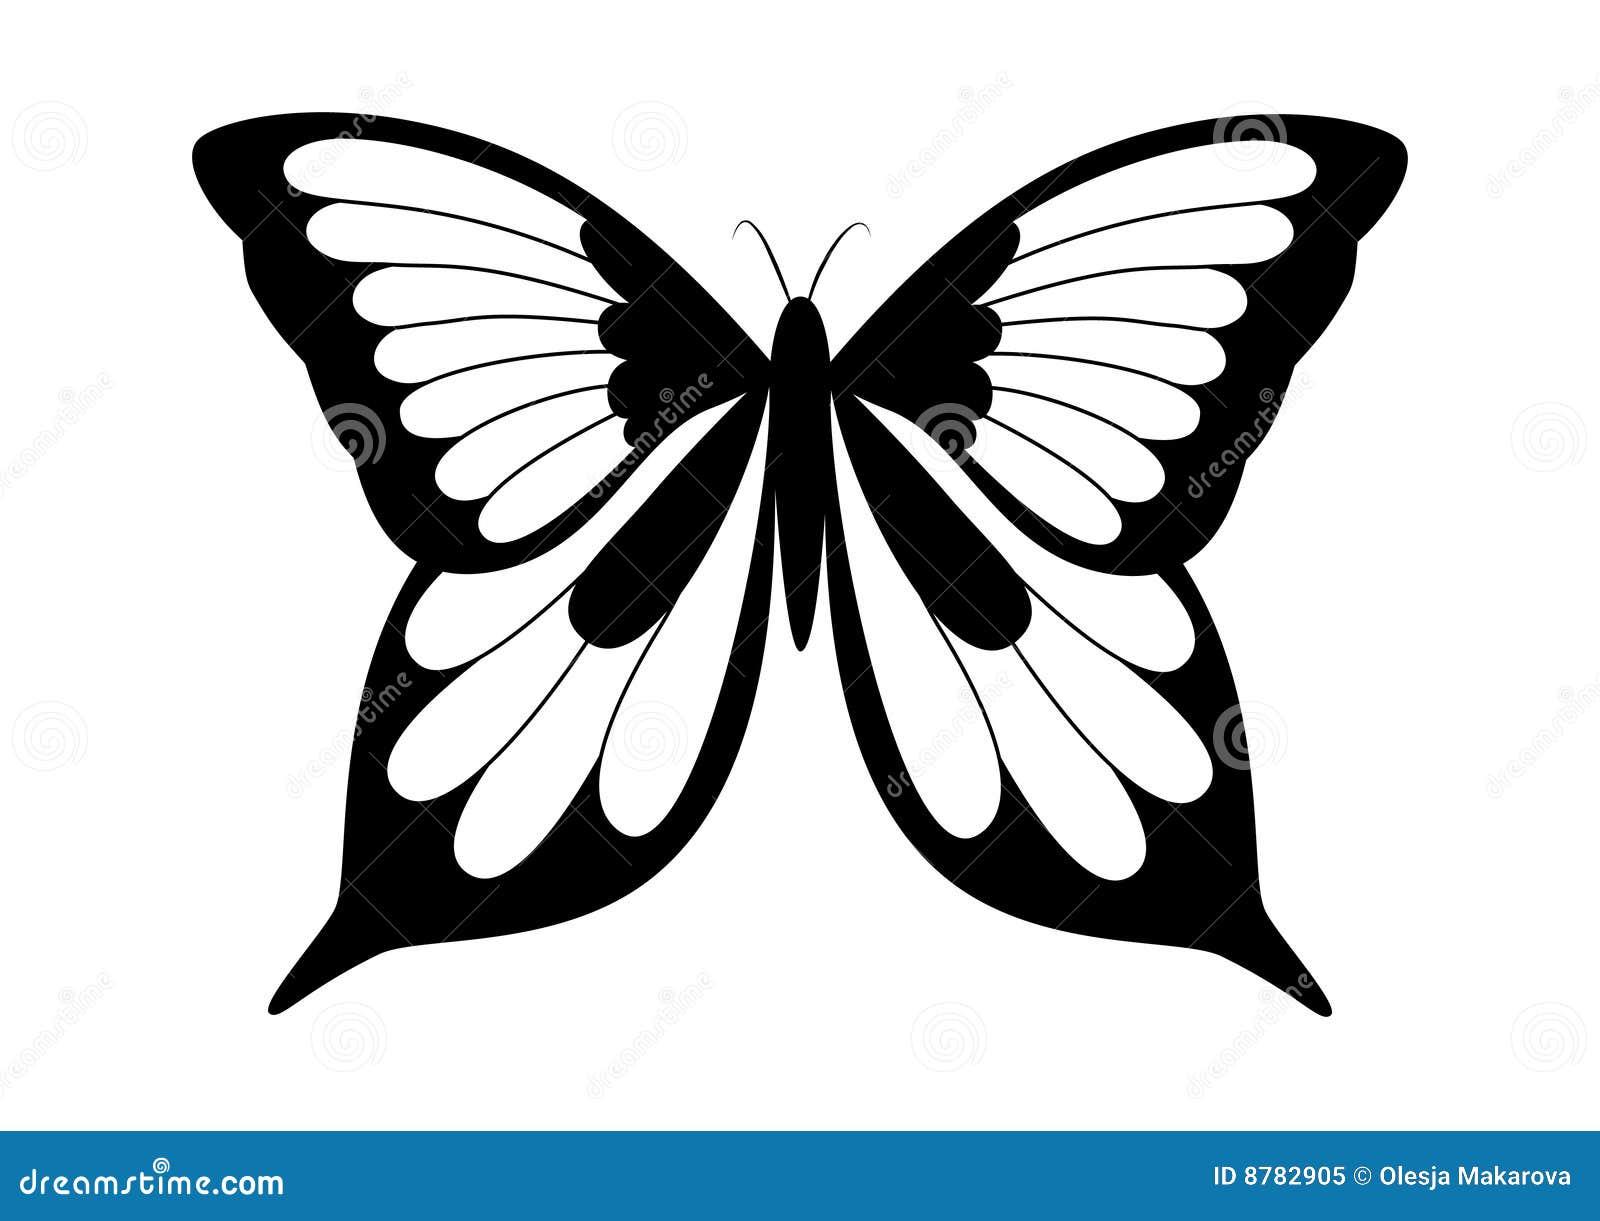 Gratis Kleurplaat Vlinder Black And White Elegant Butterfly Stock Vector